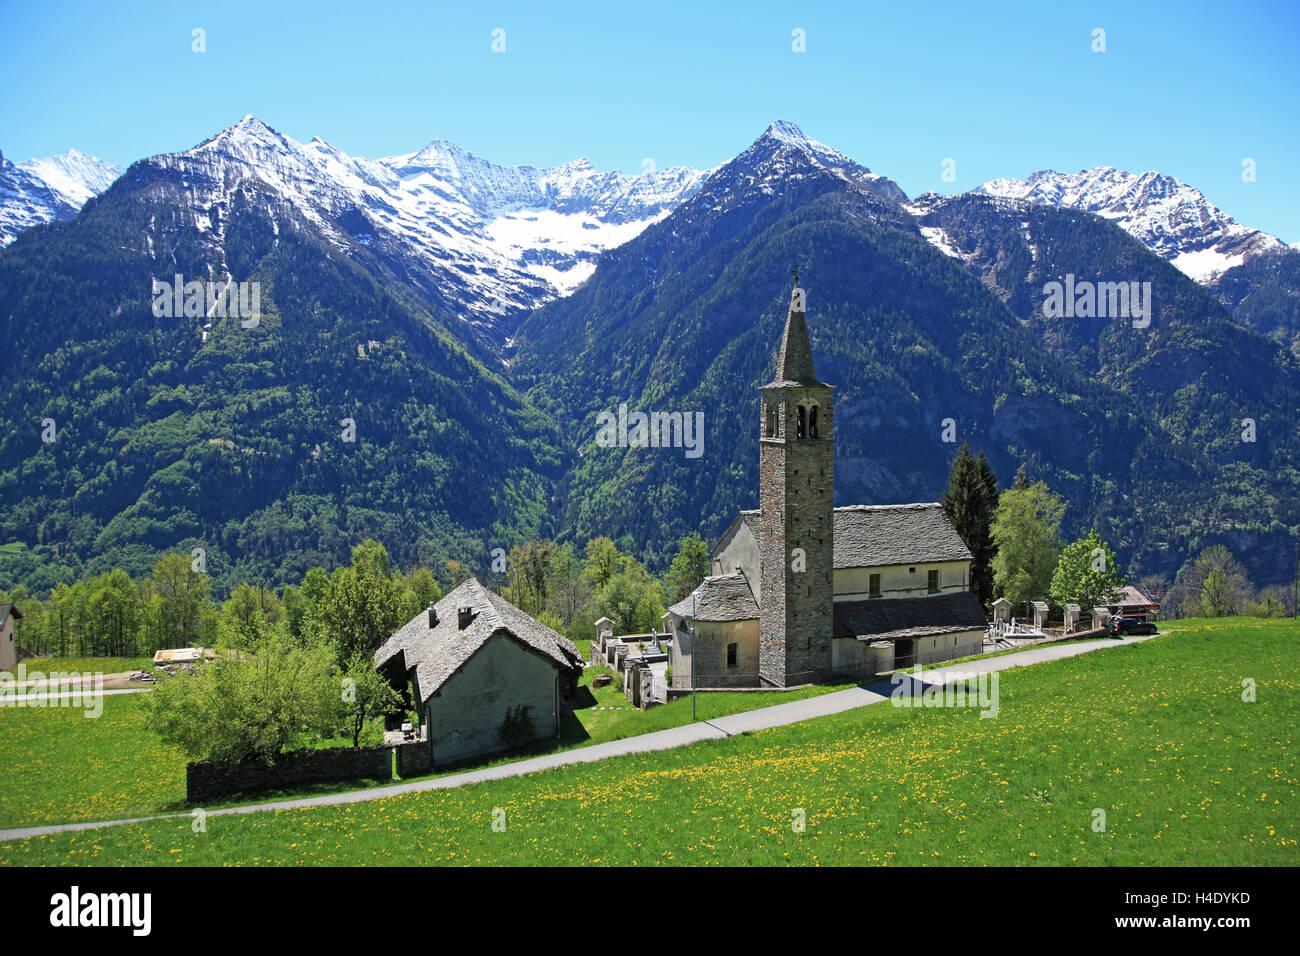 Switzerland, Canton Ticino, Leventina Valley, Sobrio Stock Photo